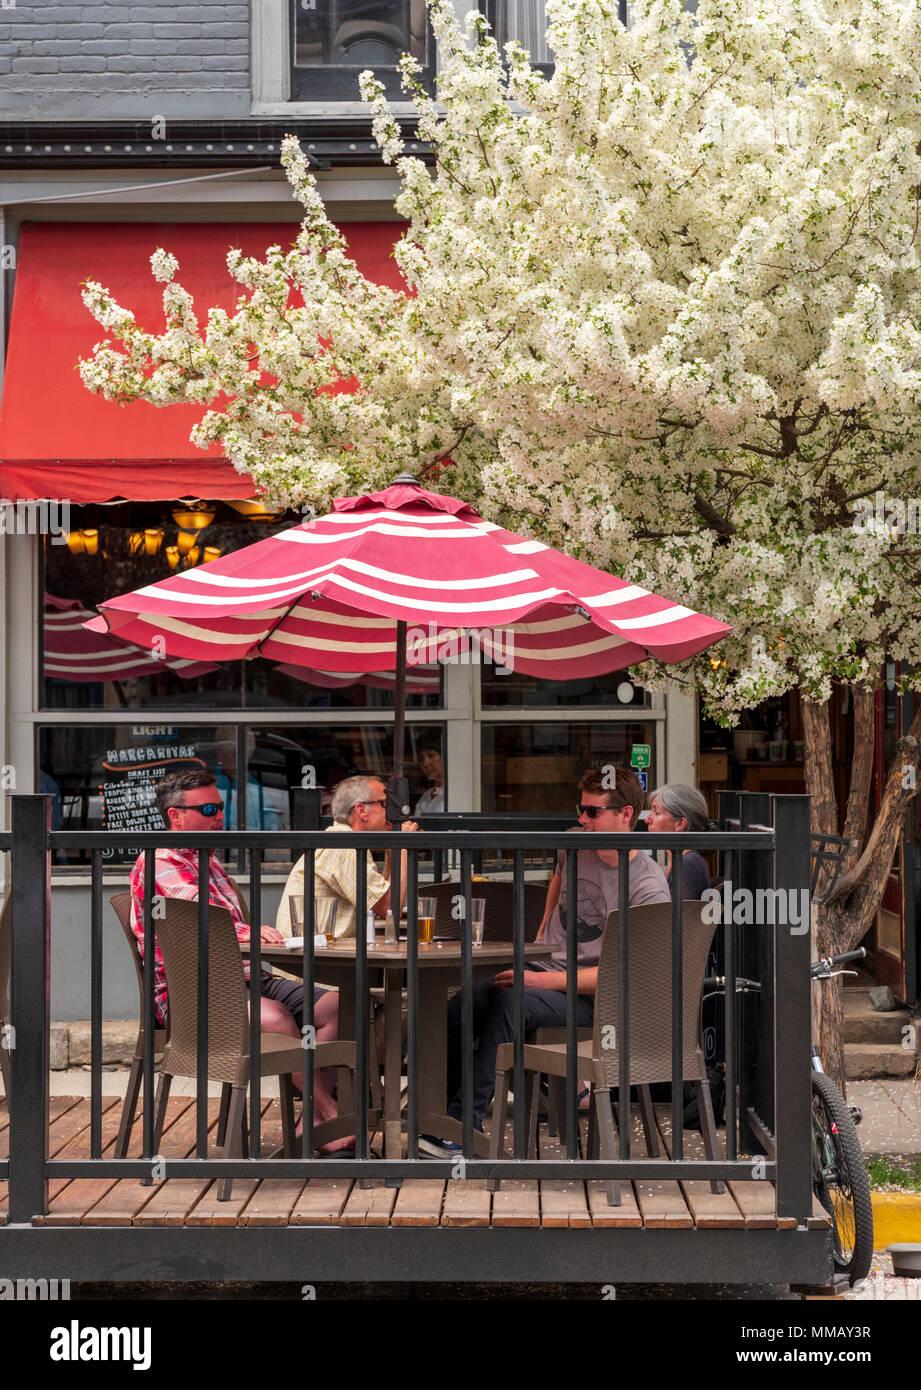 Flowering Cherry Blossom tree; Prunus; Ströme Restaurant & Cafe, Salida, Colorado, USA Stockbild